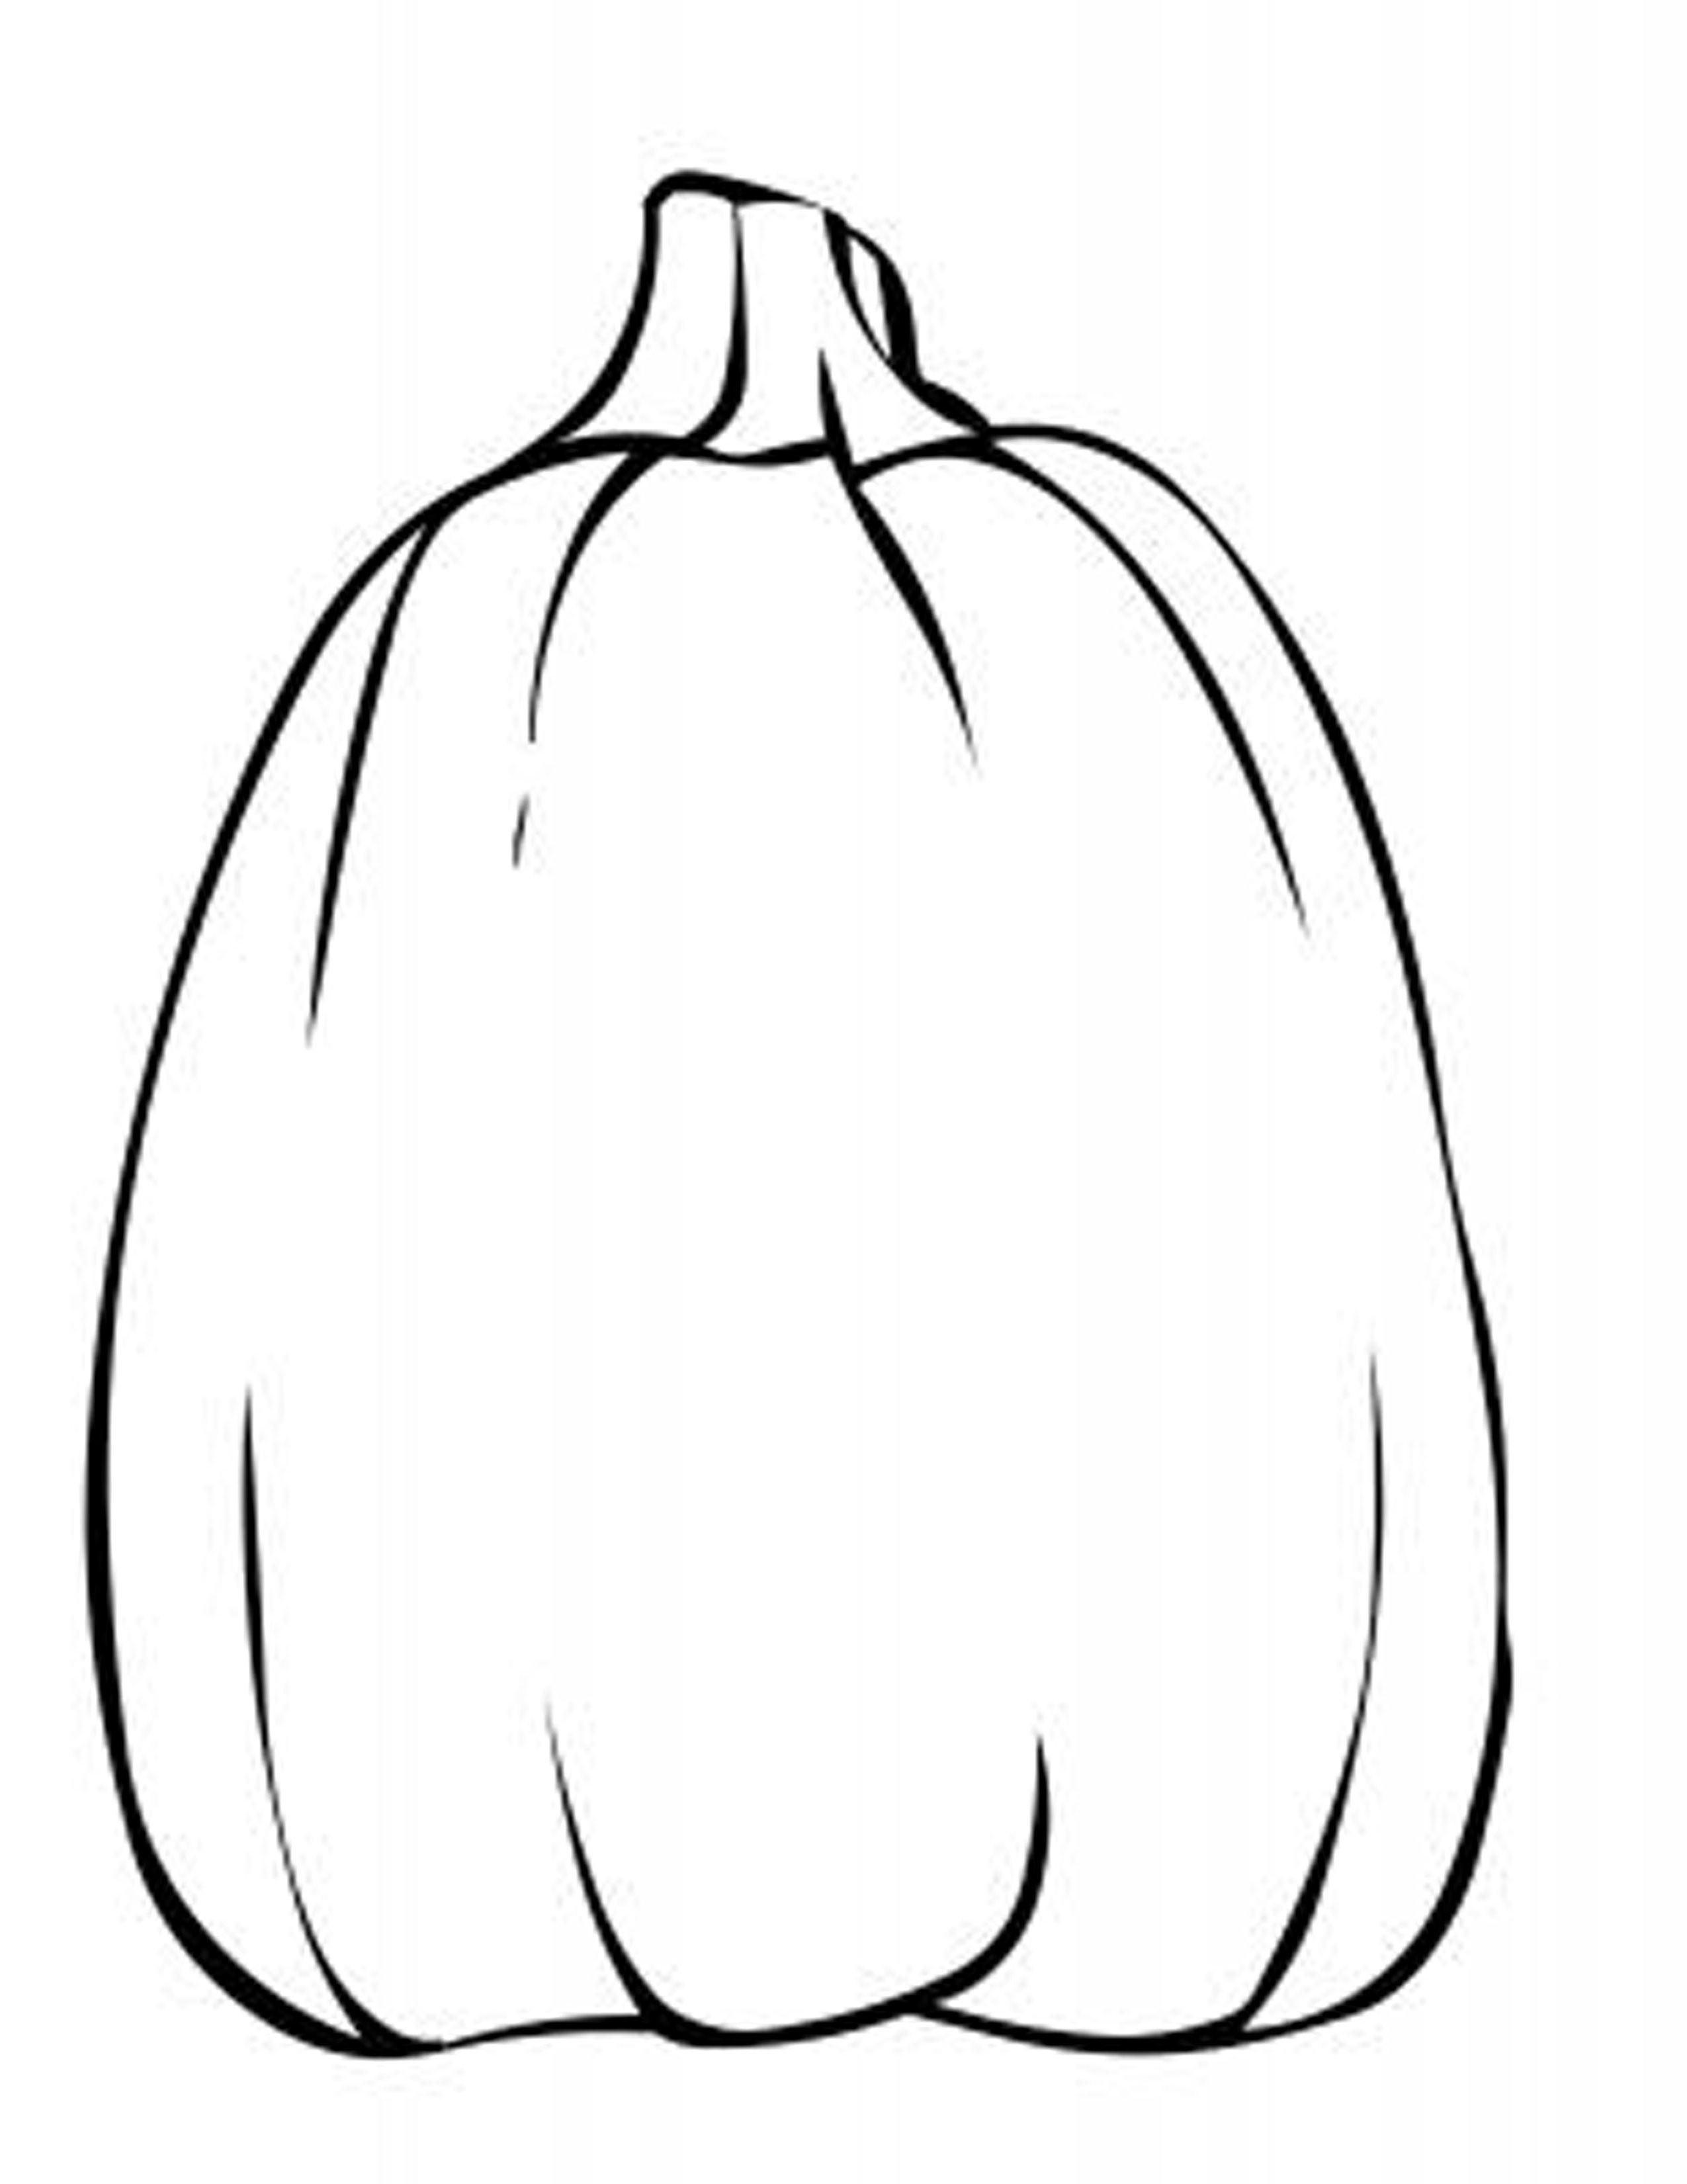 Coloring Page Of Pumpkin Preschool Easy Fall Pumpkin Coloring Pages Printable Coloring Pages